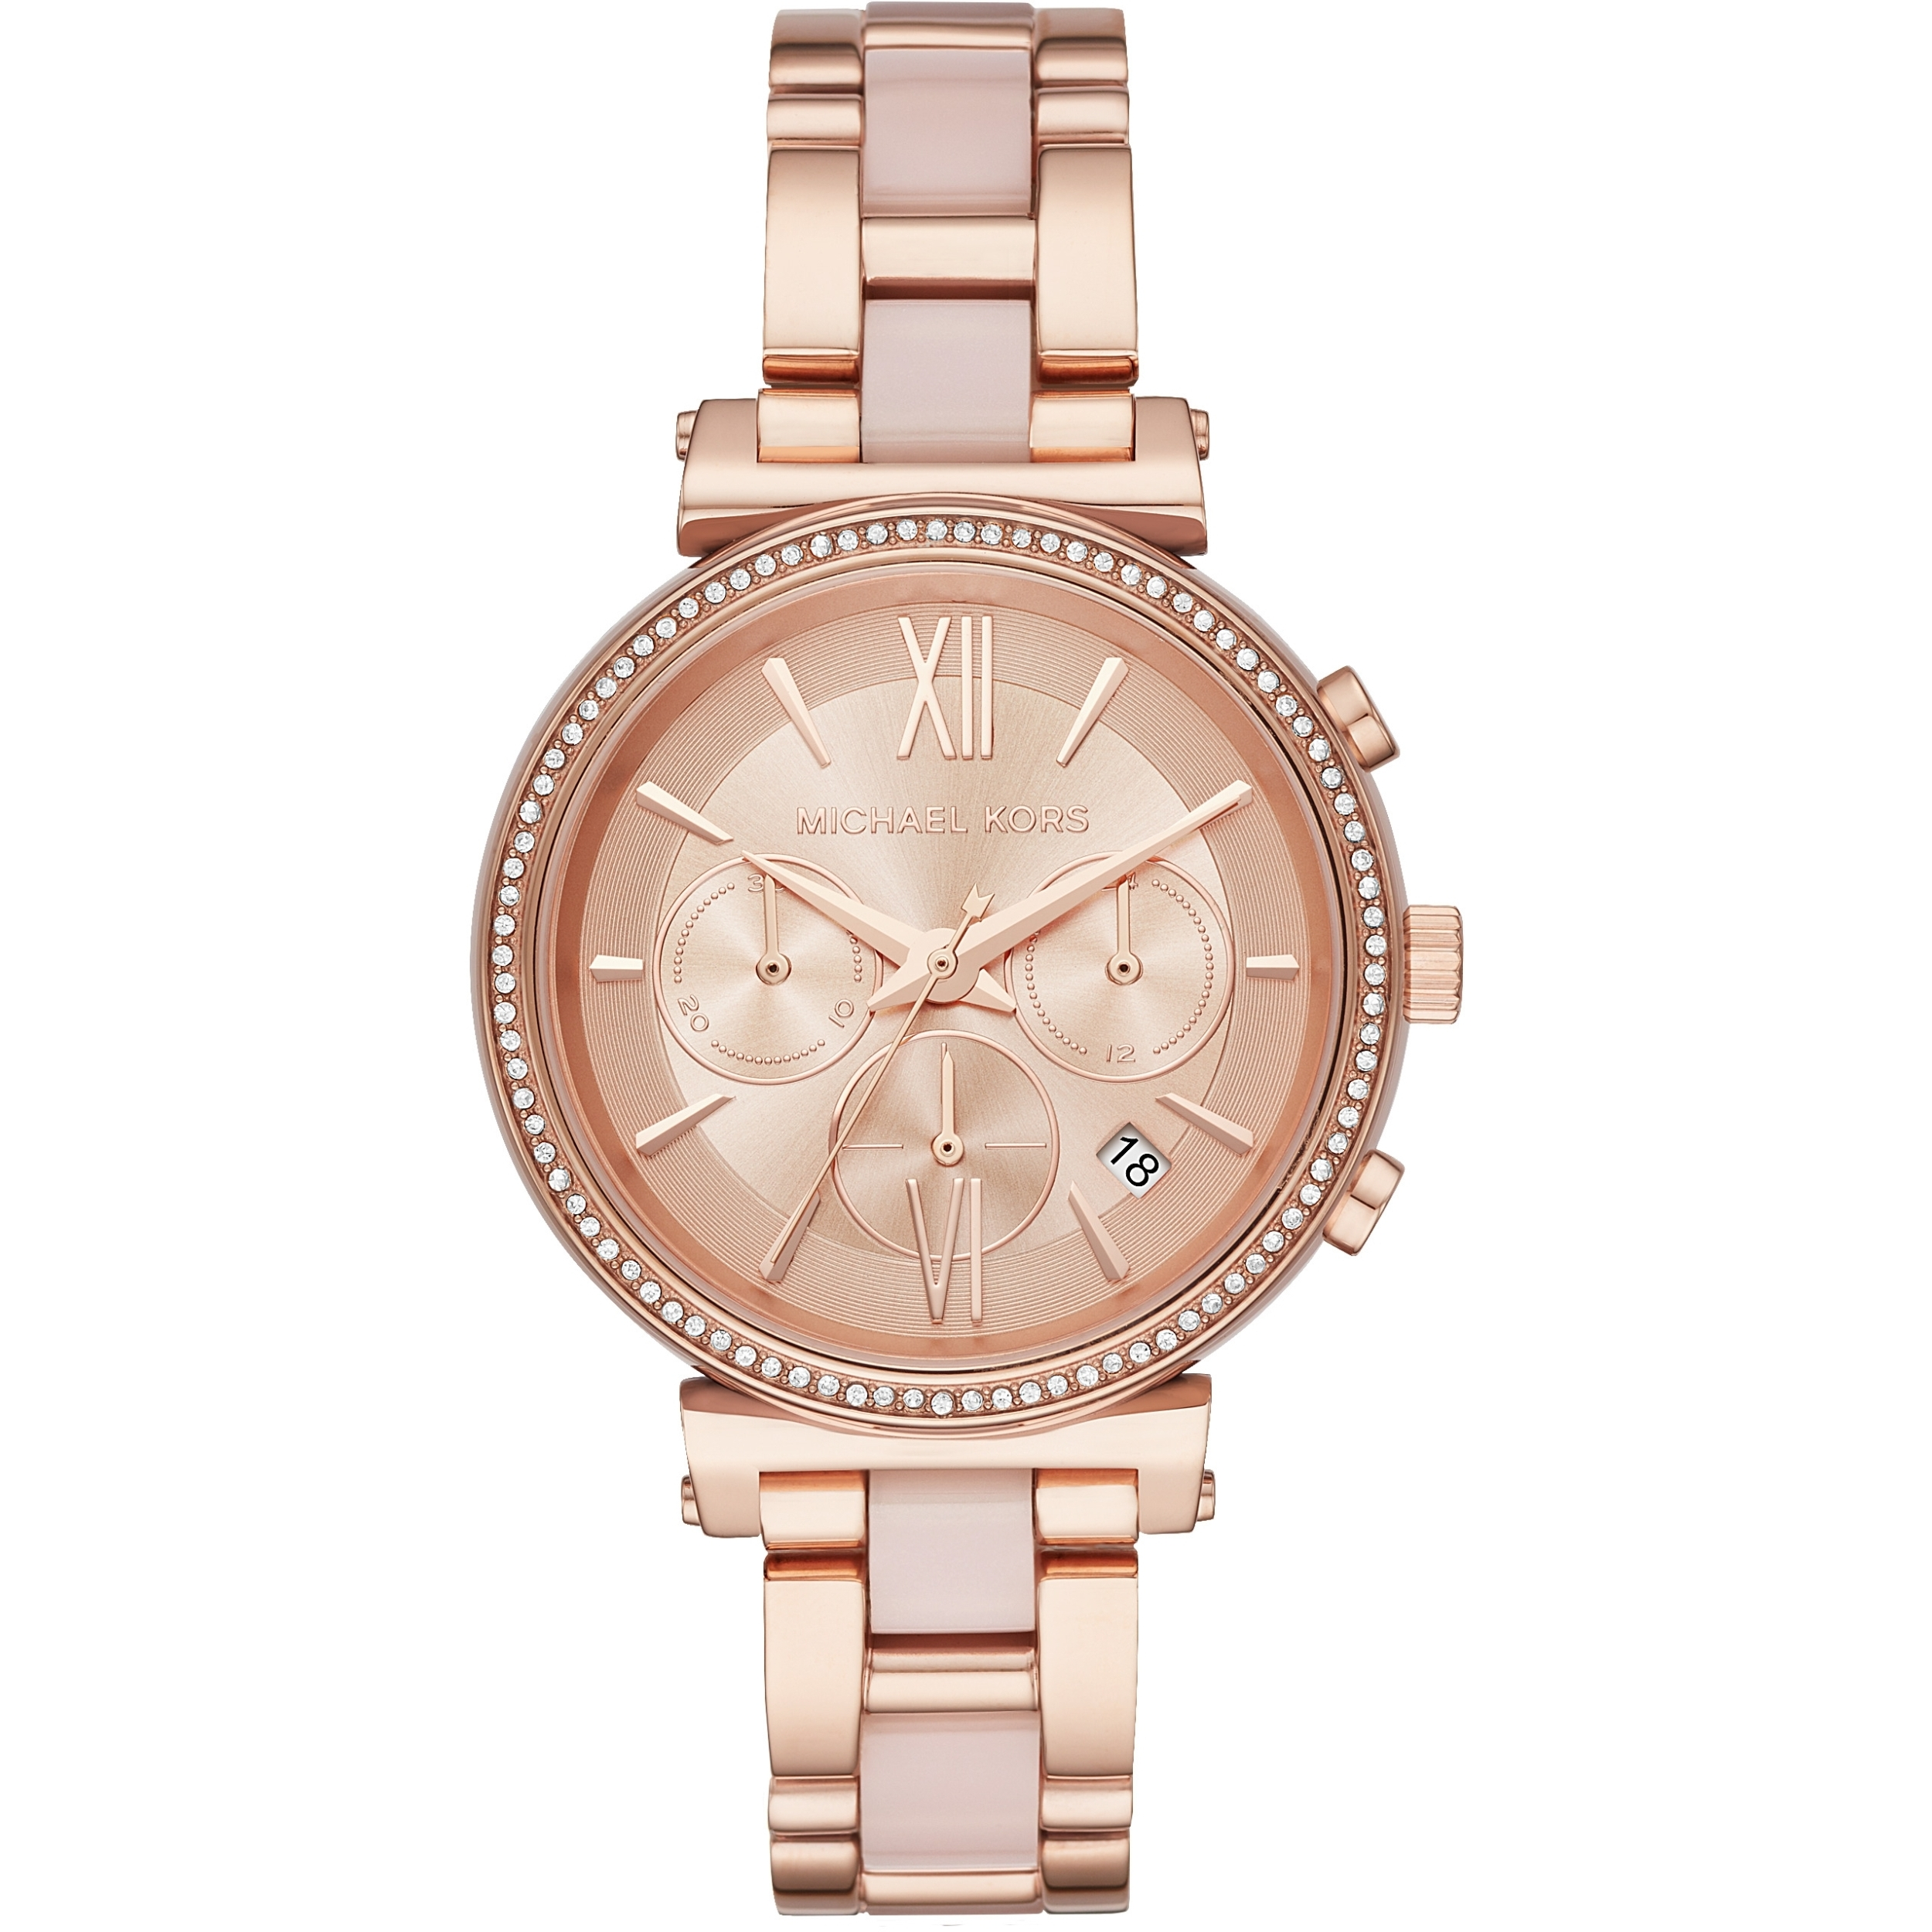 fbbd30aa9857 Michael Kors Sofie Watch (MK6560)